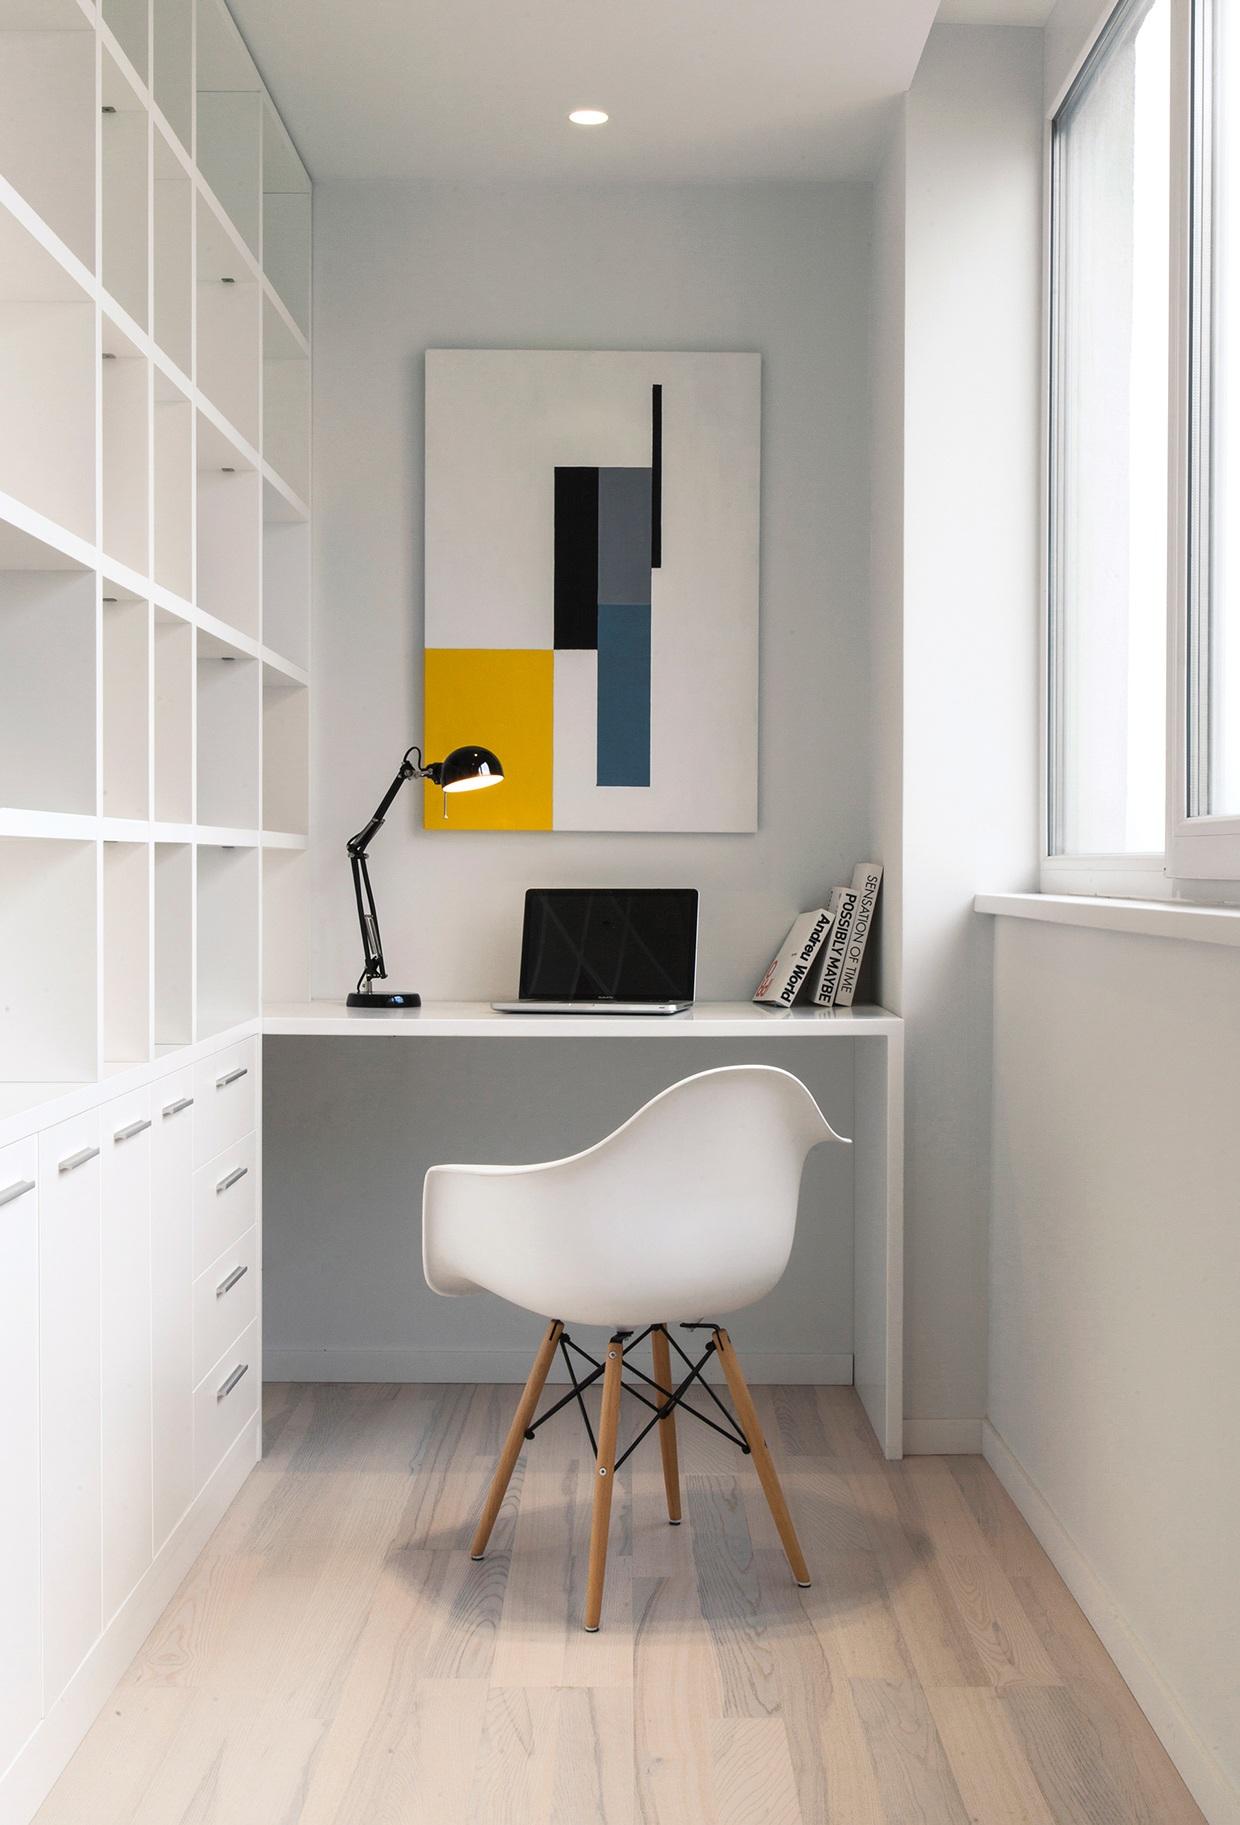 Eames Chair Interior Design Ideas